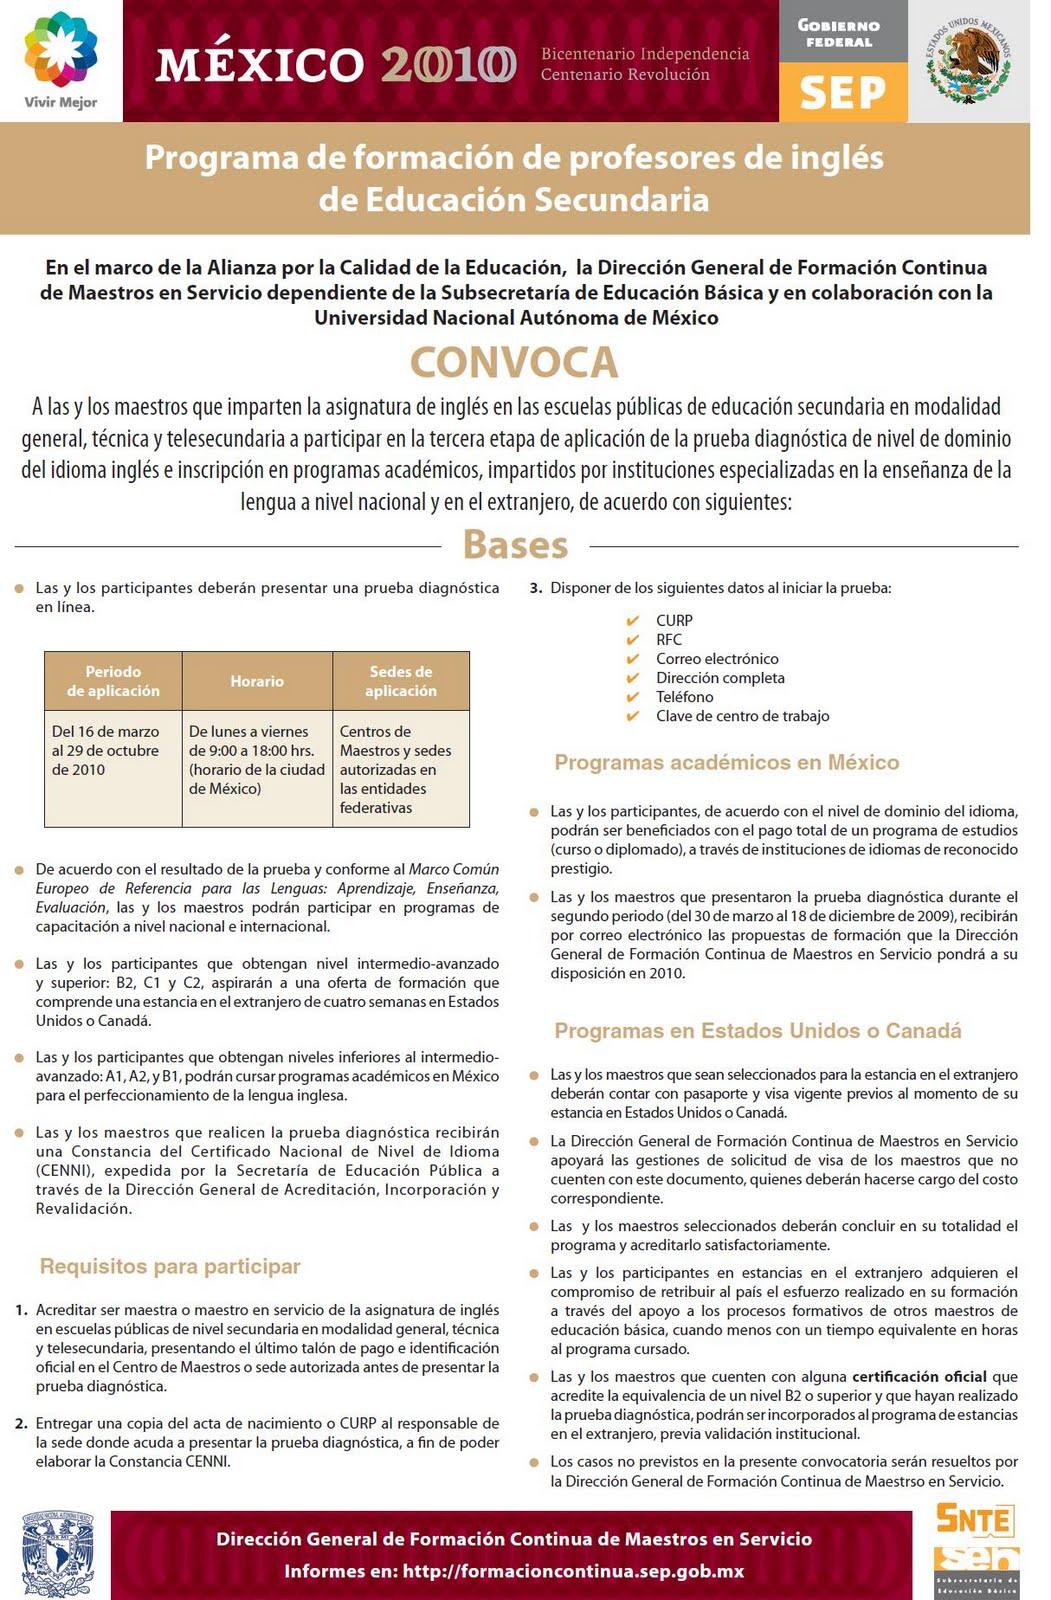 Centro de maestros 0303 la paz convocatoria para for Convocatoria de maestros